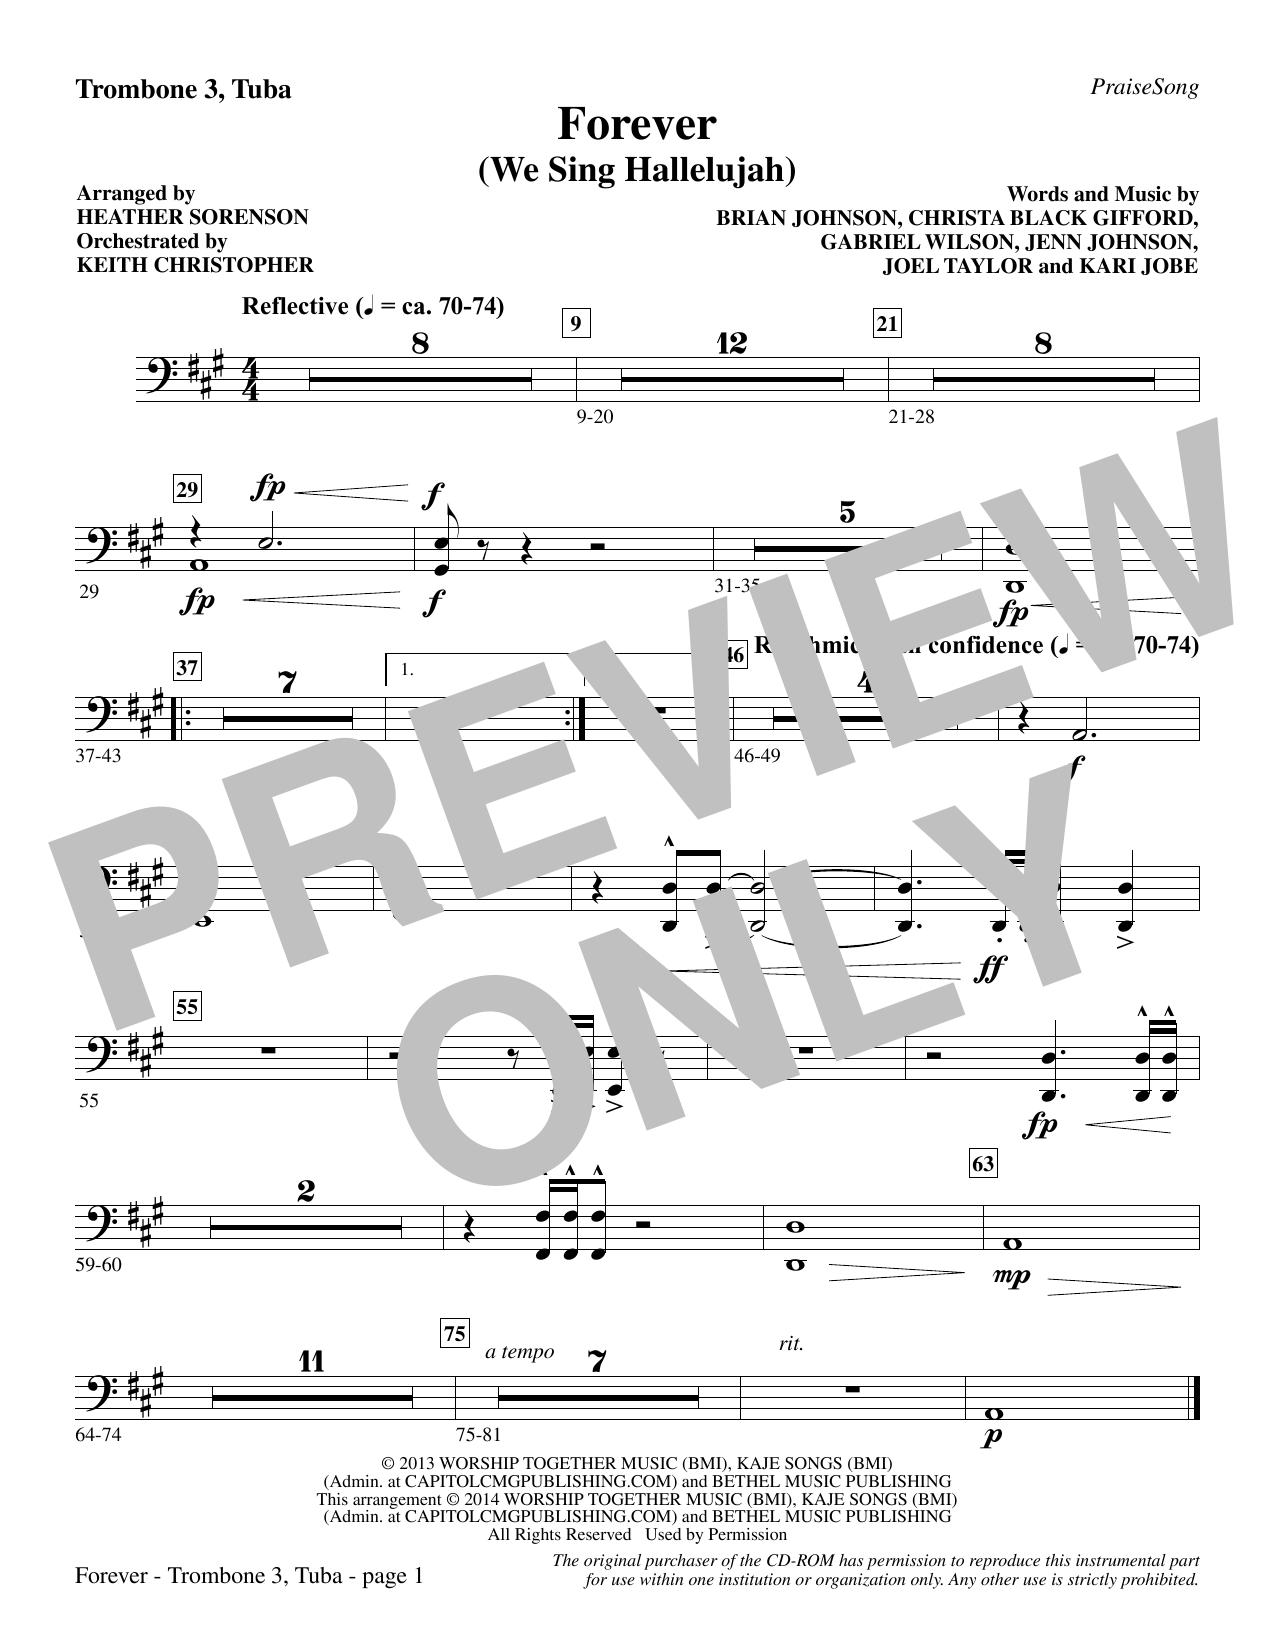 Forever (We Sing Hallelujah) - Trombone 3/Tuba (Choir Instrumental Pak)